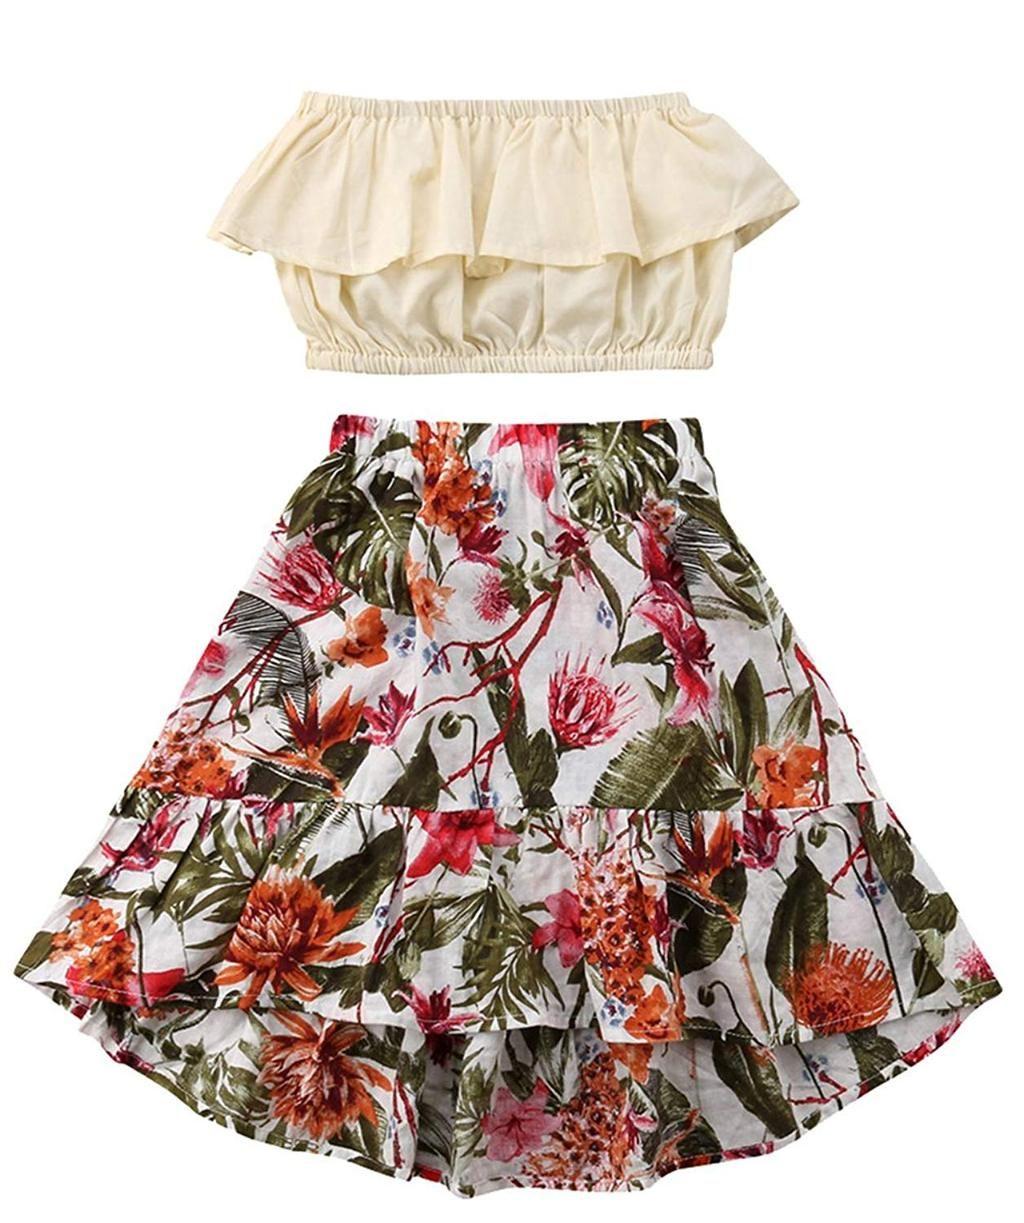 Summer Girl Sleeveless Top Skirt Dress Casual Skirt Outfits Little Girl Summer Dresses Printed Long Skirt [ 1223 x 1024 Pixel ]